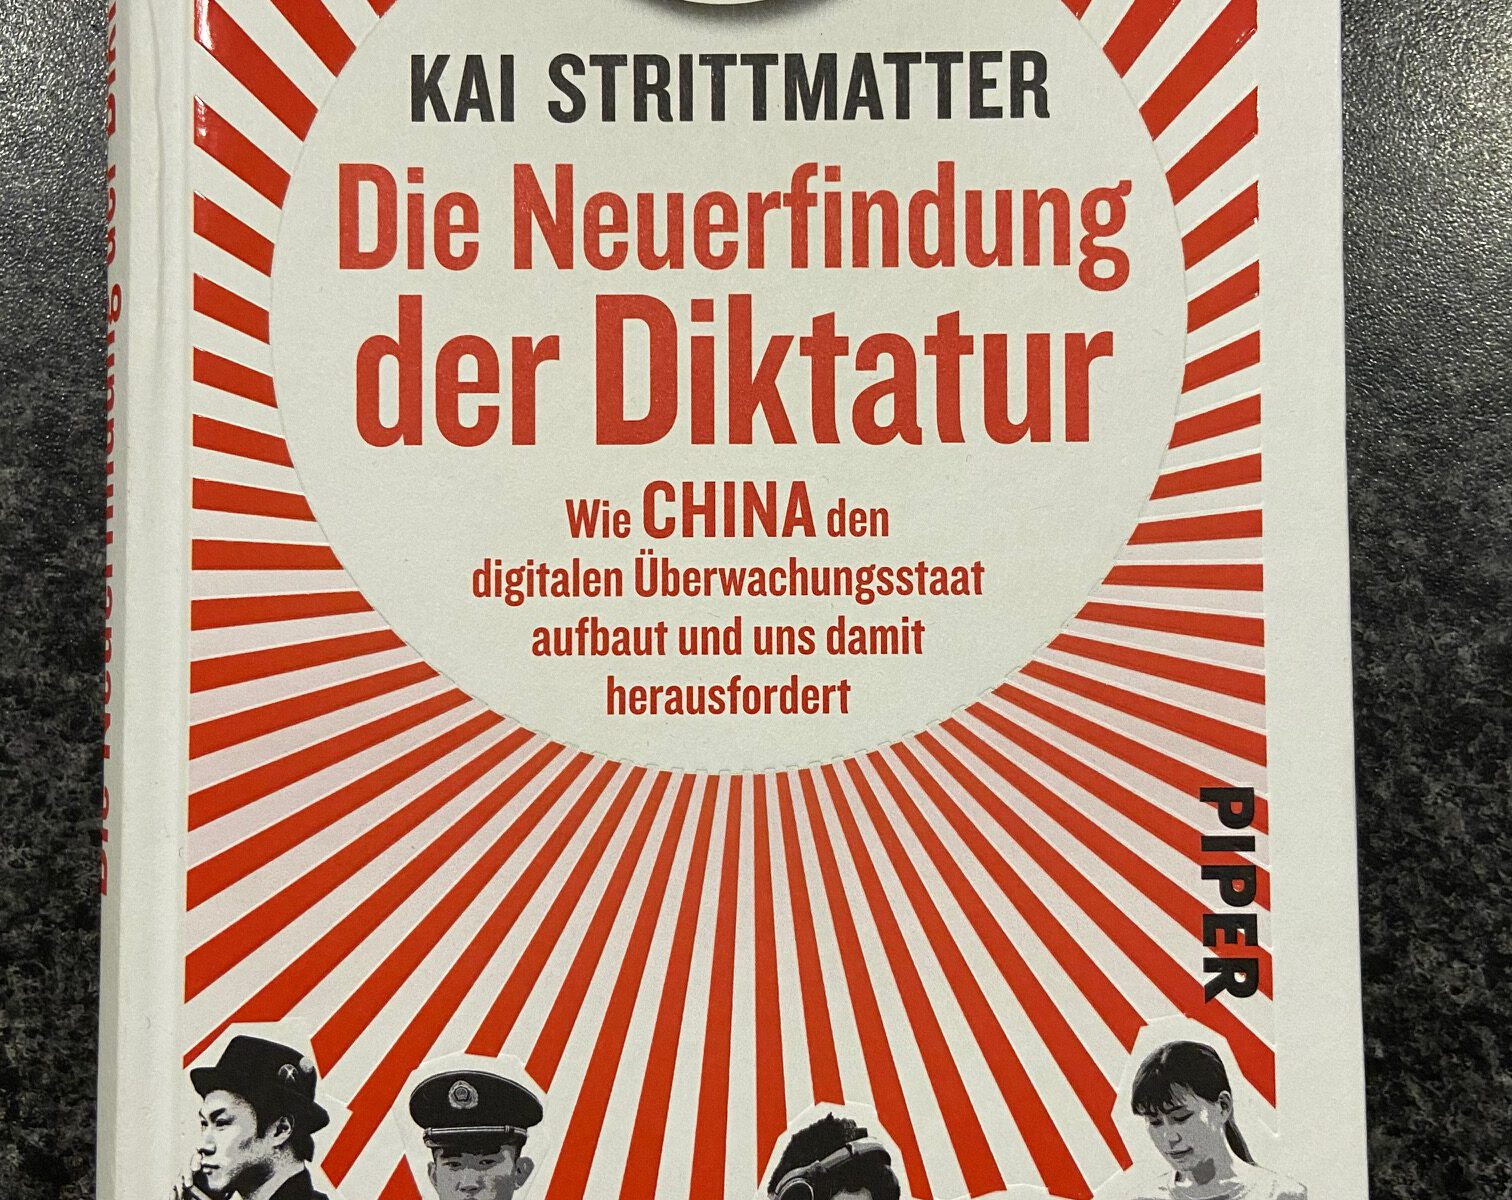 Buchtipp Pluralisten China Diktatur Offene Gesellschaft Europa